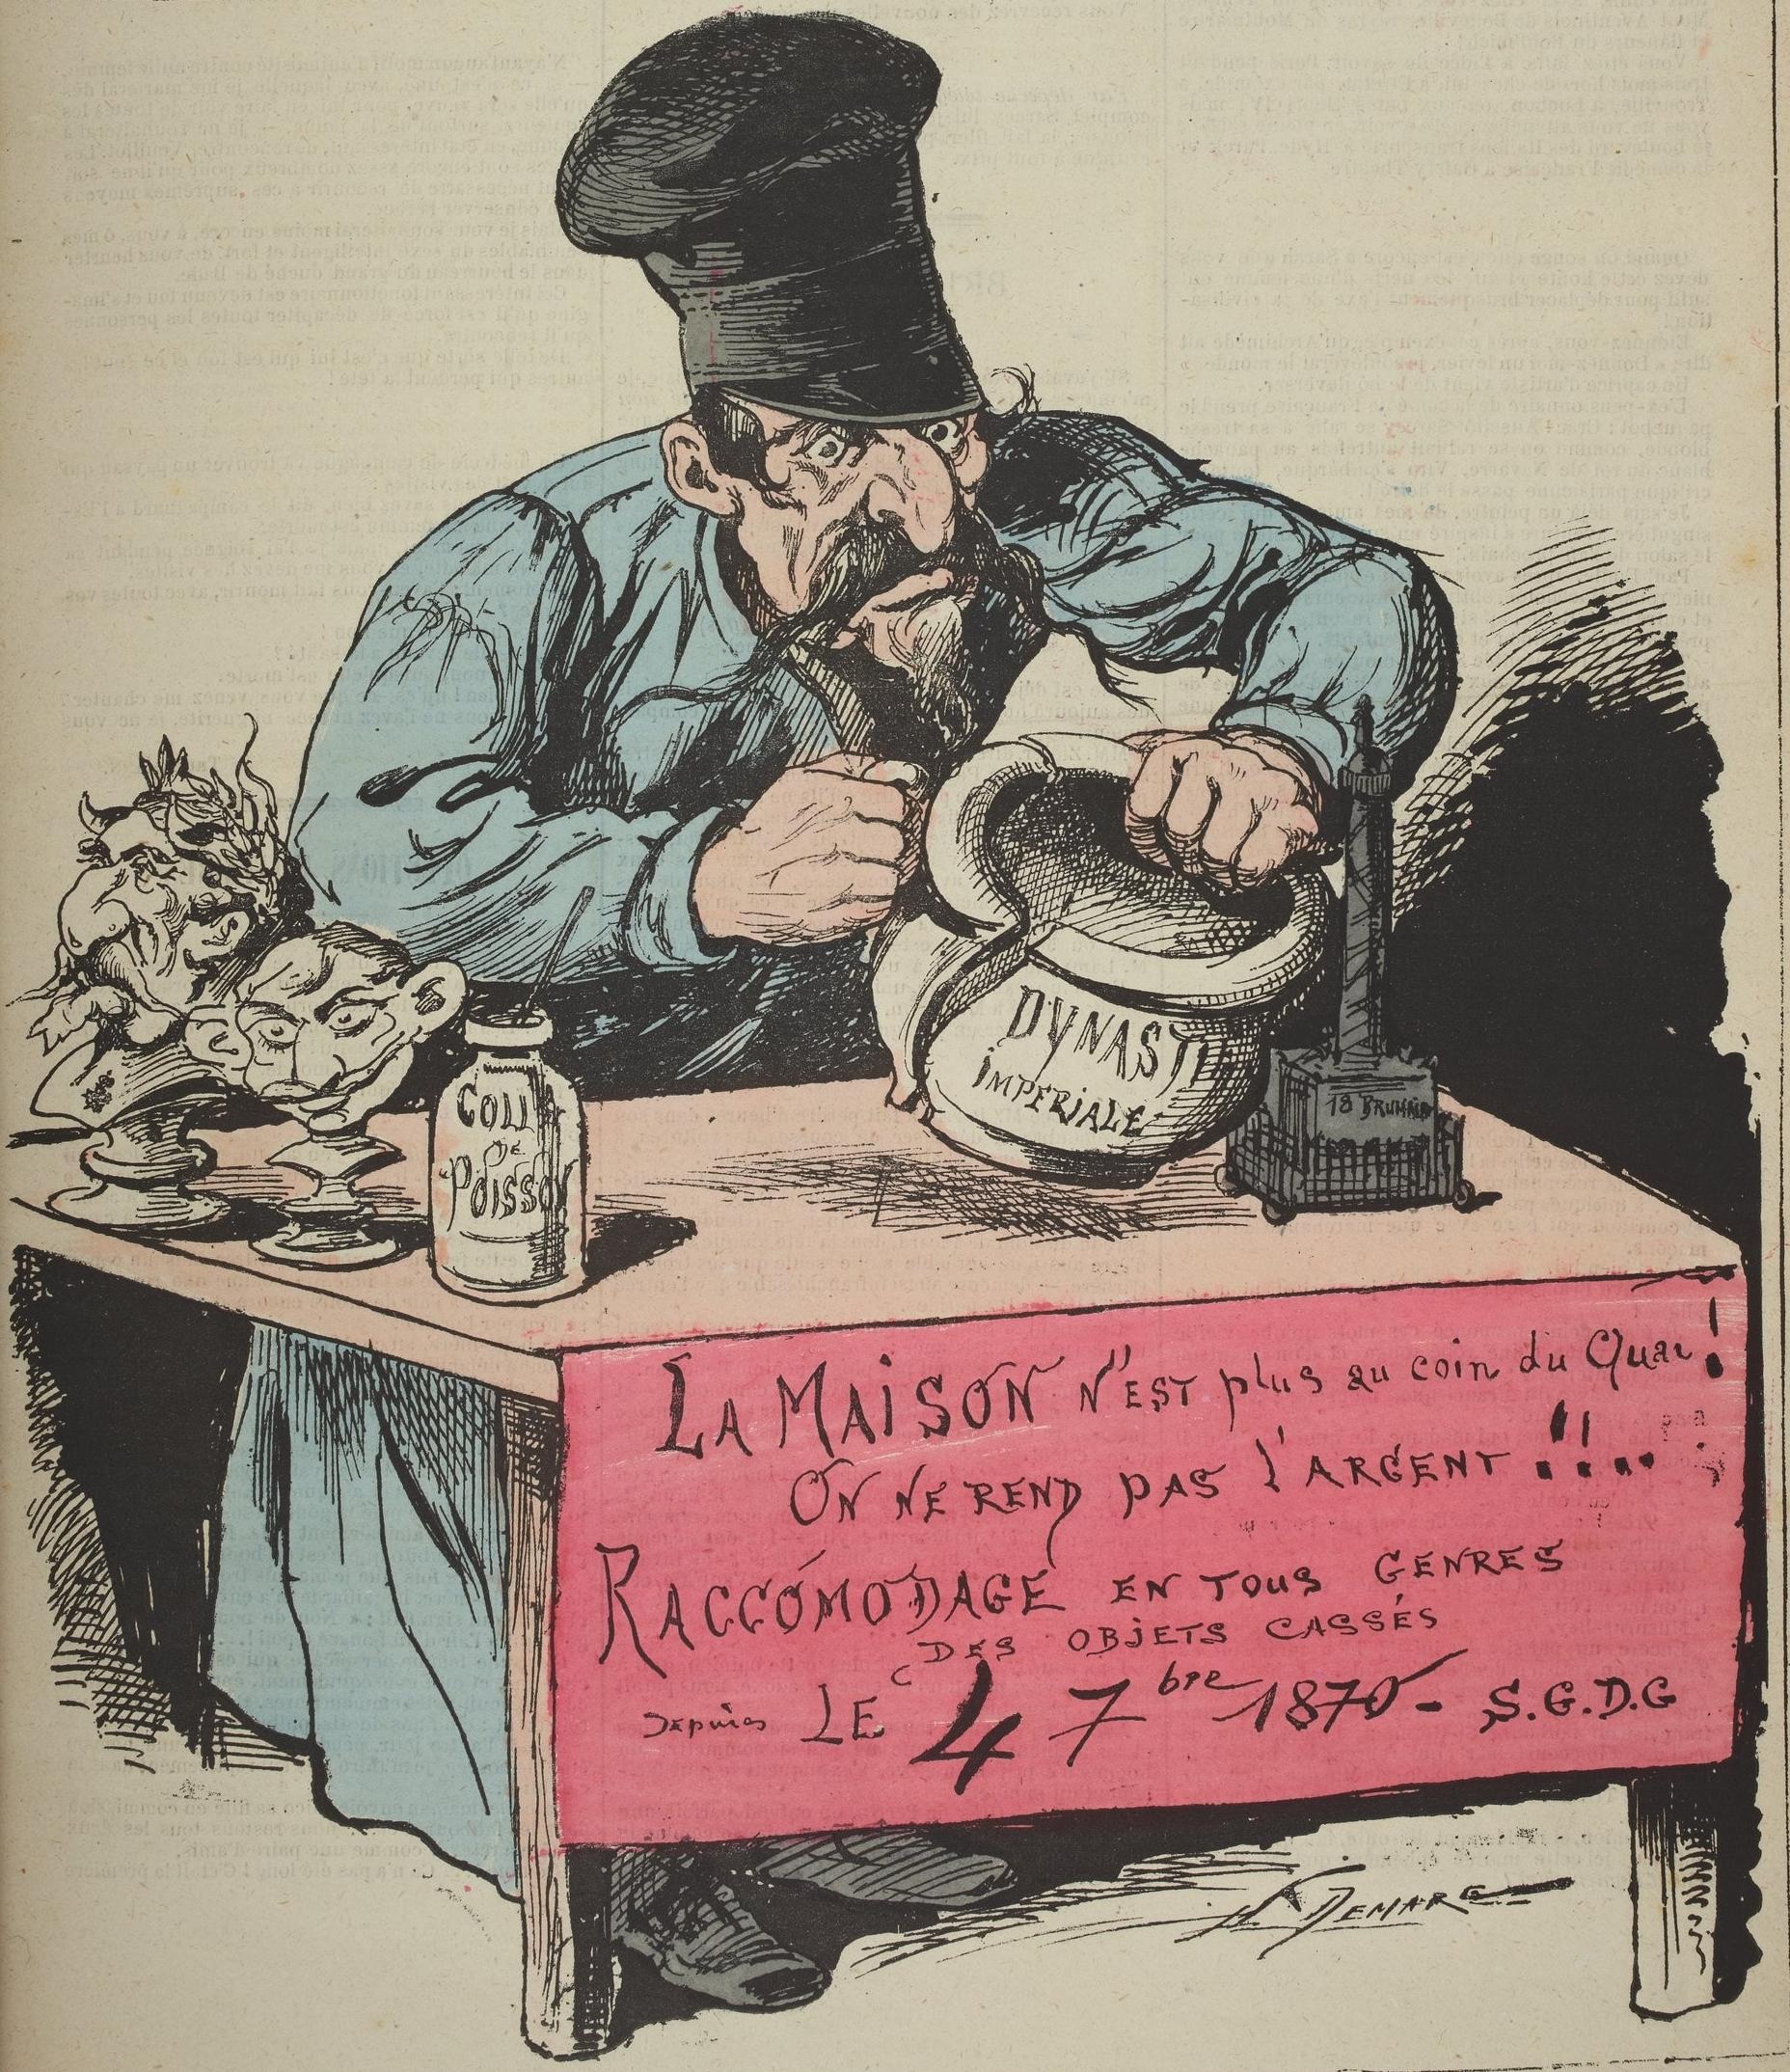 File:Caricature de Napoléon III (1880) jpg - Wikimedia Commons